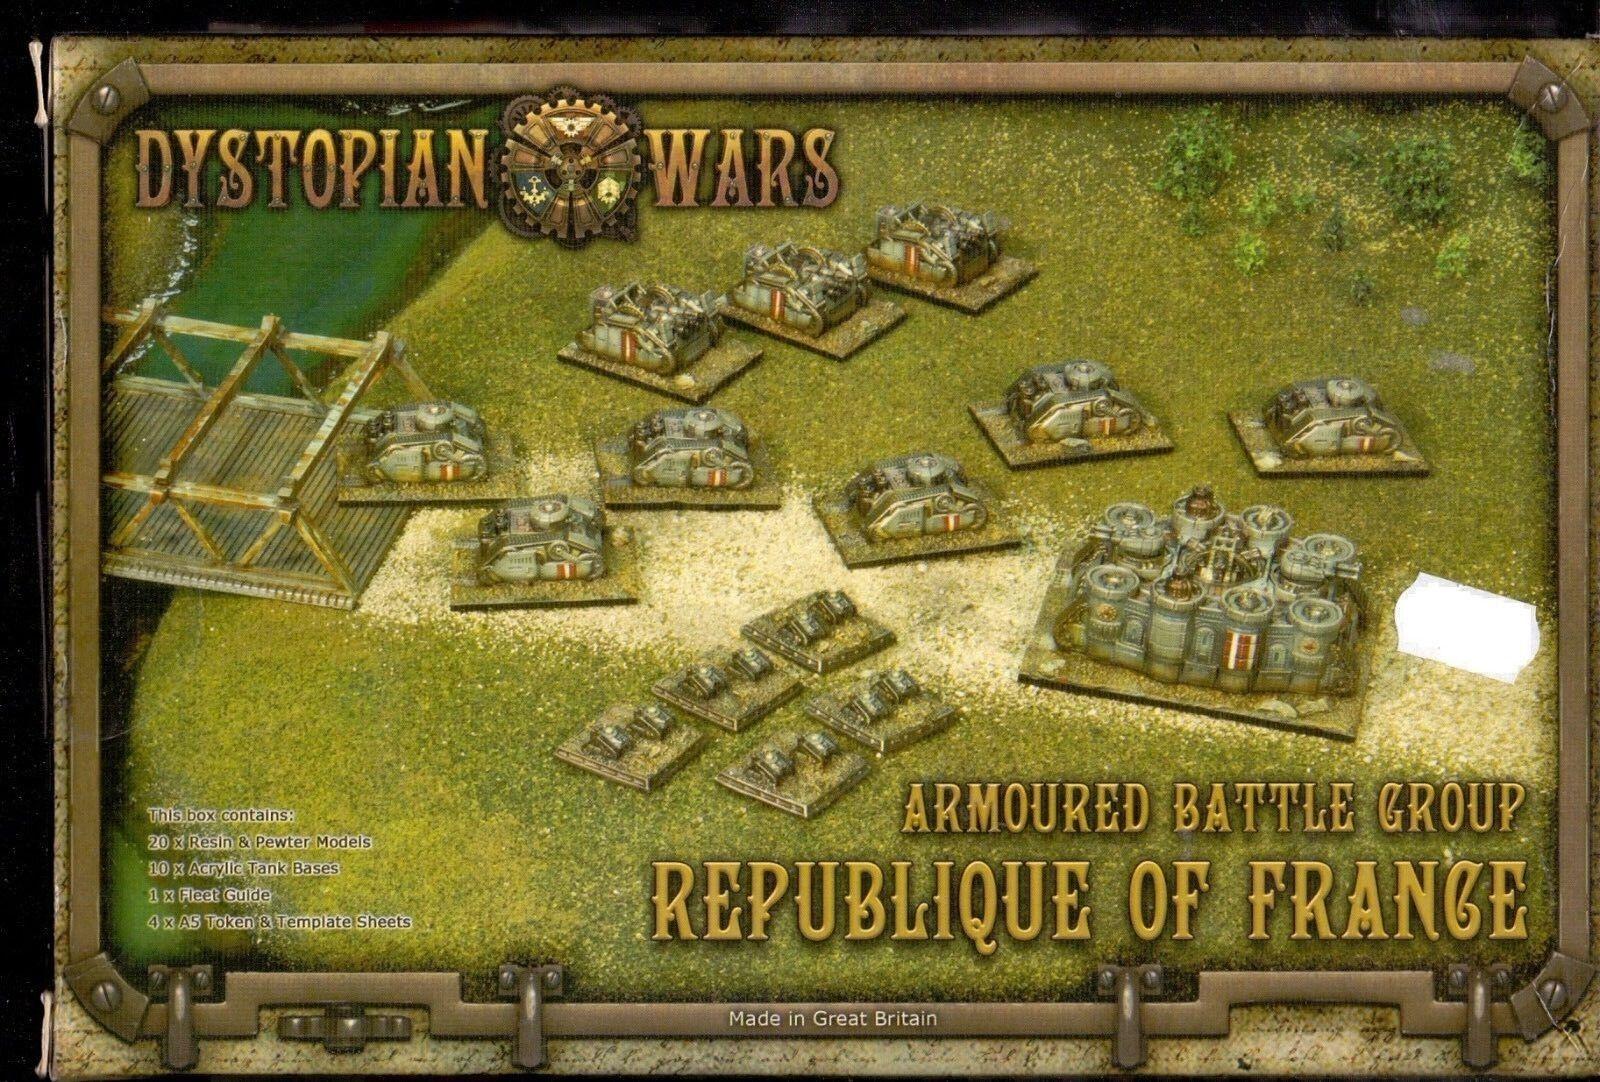 SPARTAN GAMES DYSTOPIAN WARS ARMOUrot BATTLE GROUP REPUBLIQUE OF FRANCE BOX